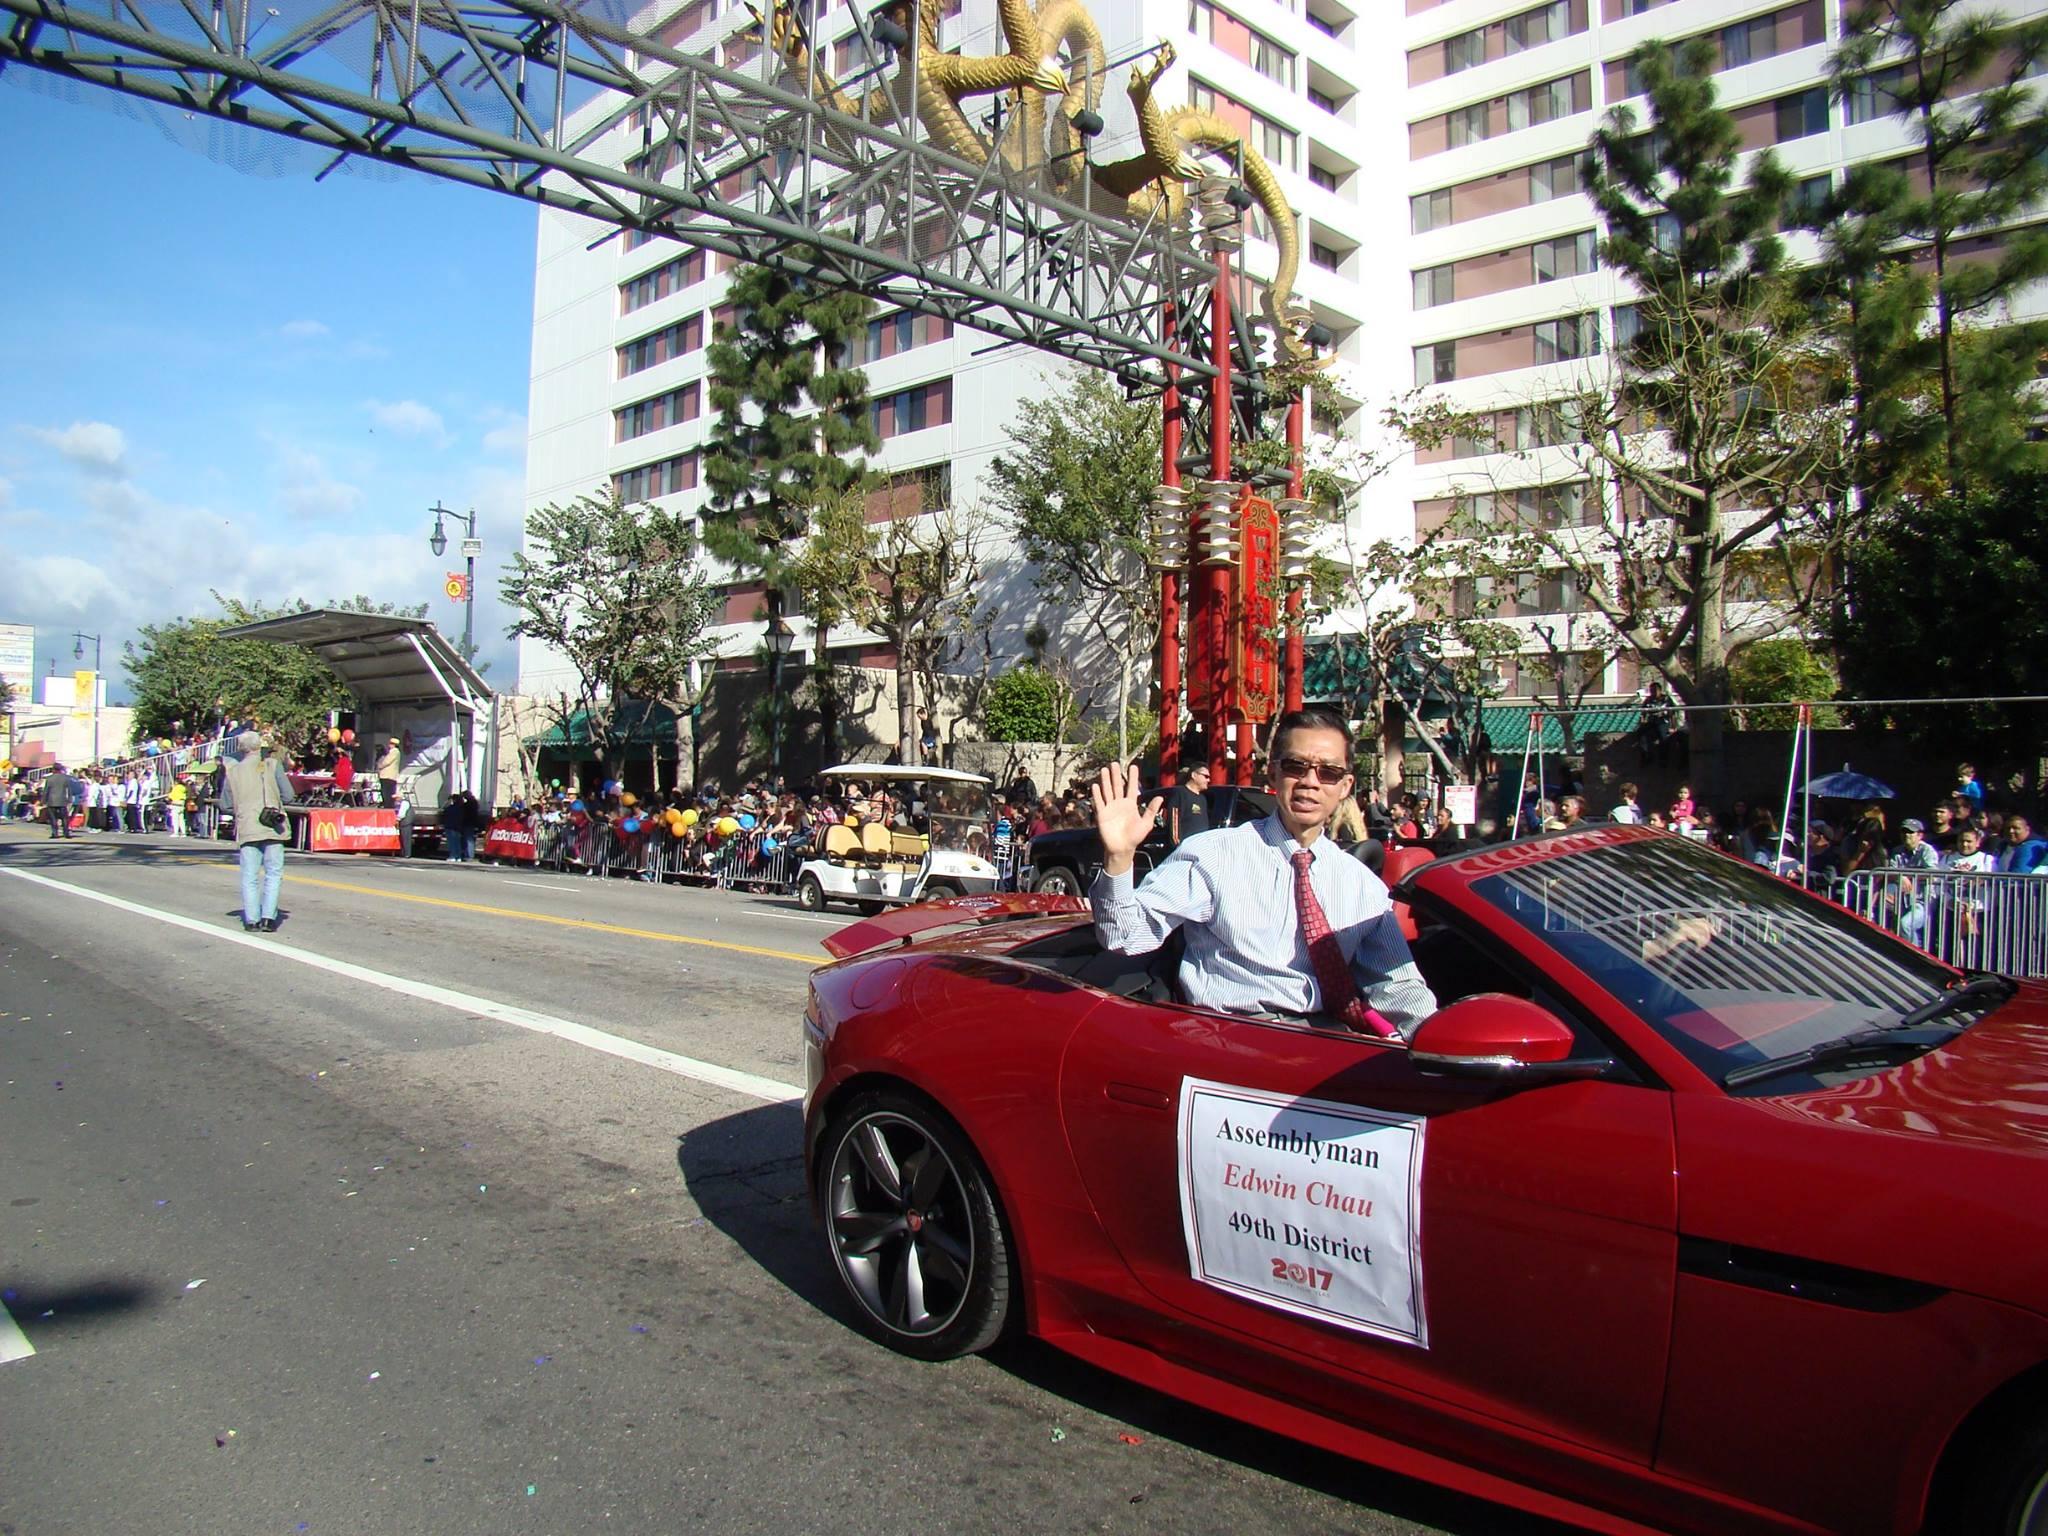 Hon. Assemblymember Ed Chau, 49th District .jpg